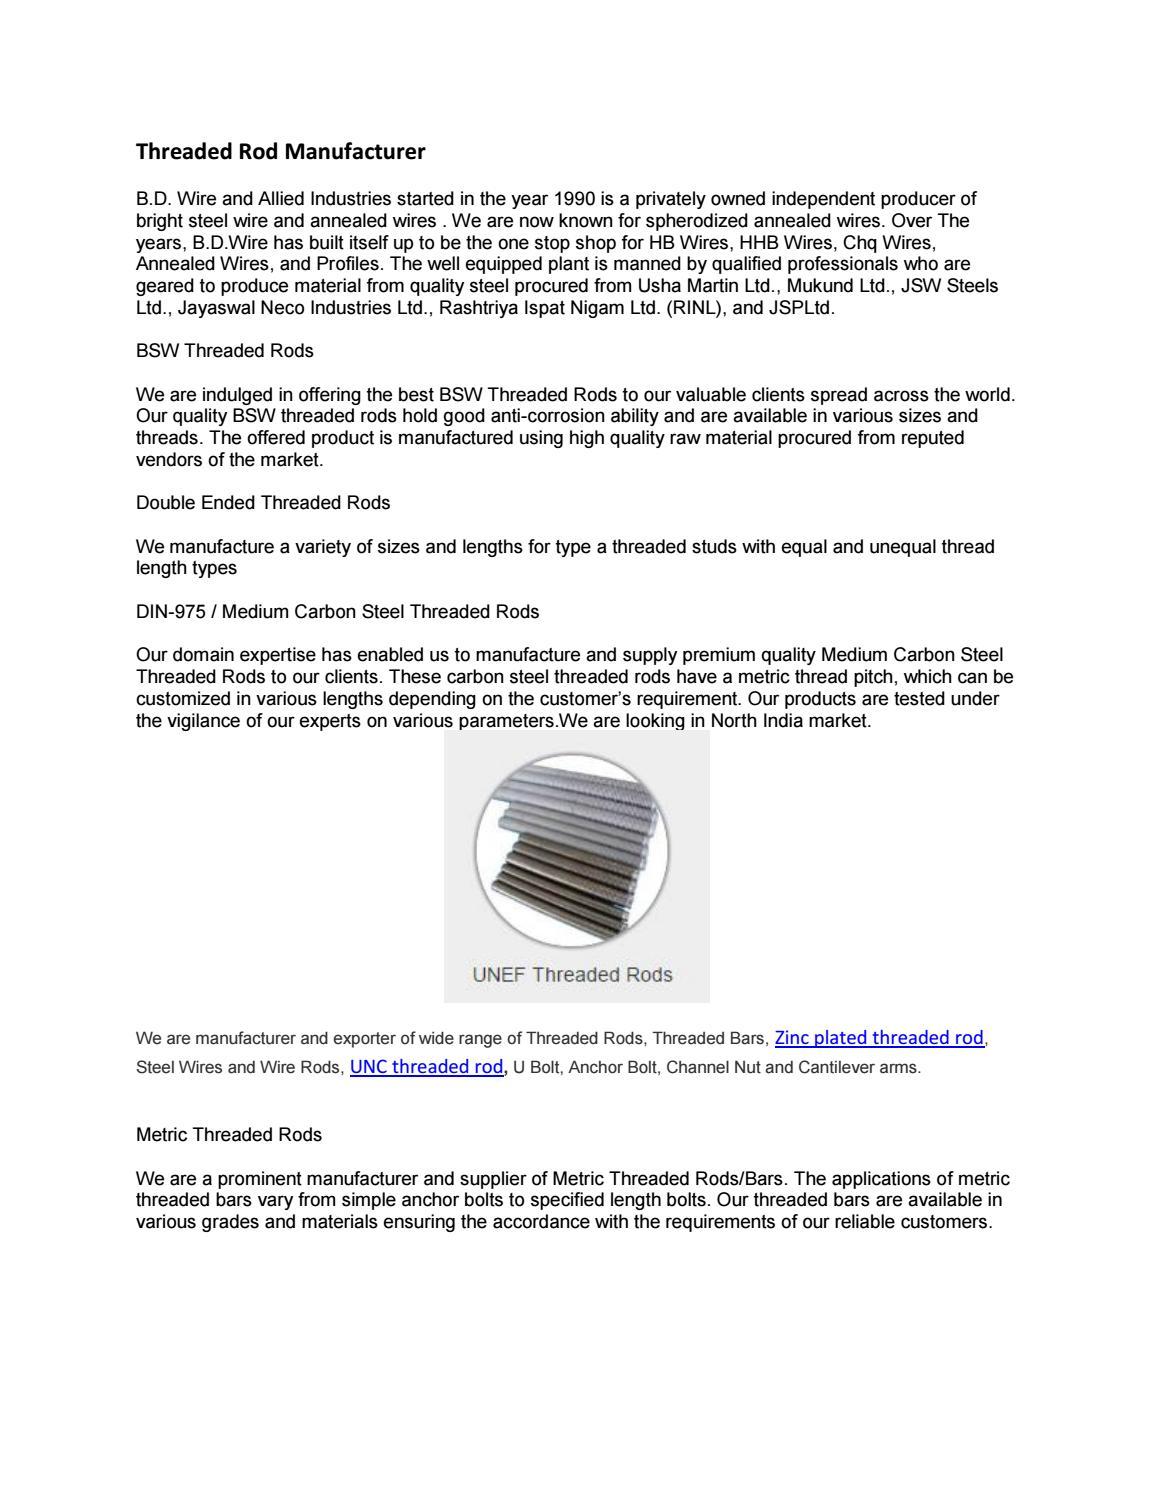 Threaded rod manufacturer by threadedrod - issuu